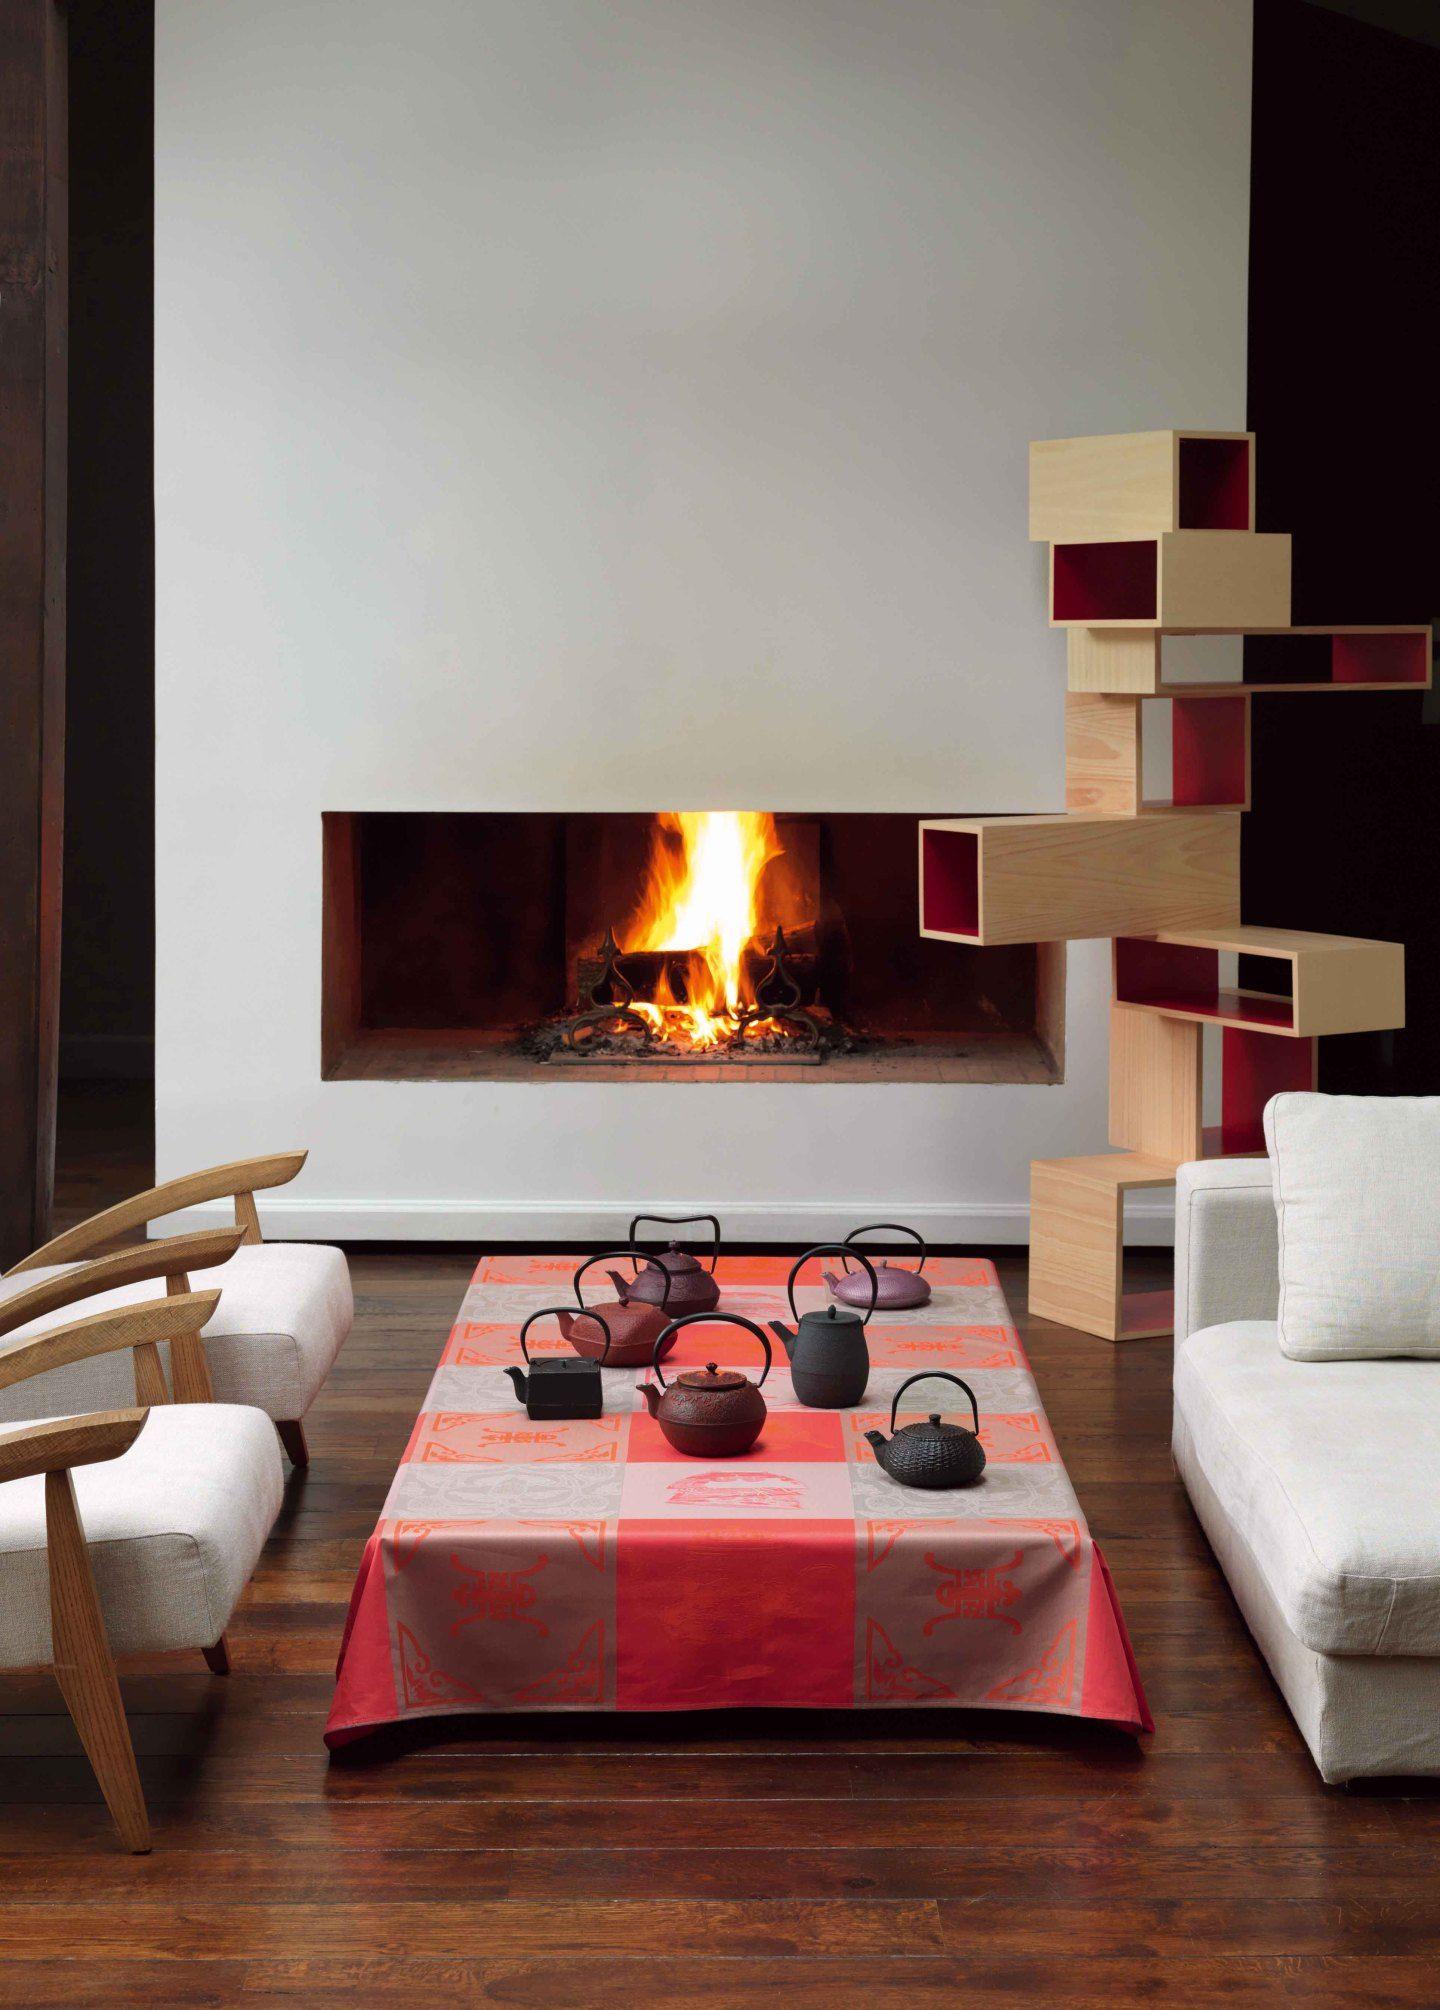 tischdecke darjeeling von le jacquard francais. Black Bedroom Furniture Sets. Home Design Ideas